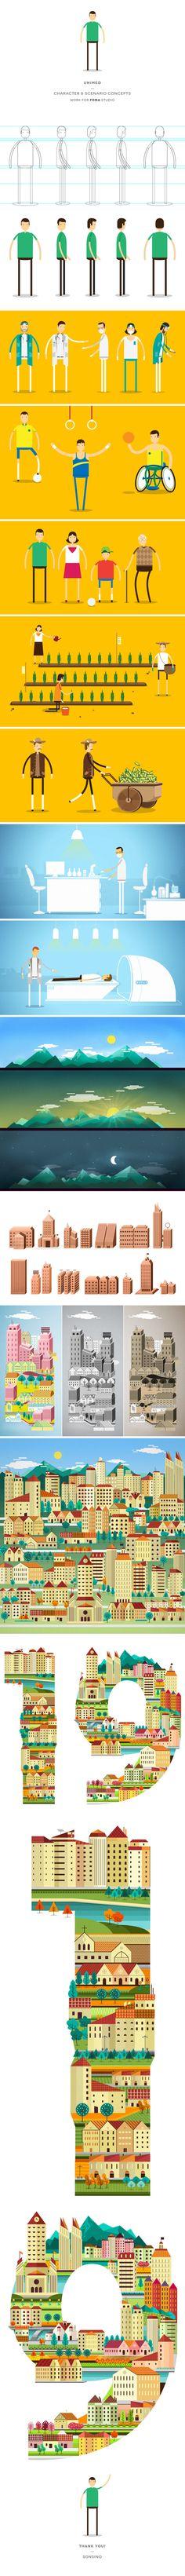 Unimed - Concepts by Raphael Sonsino, via Behance